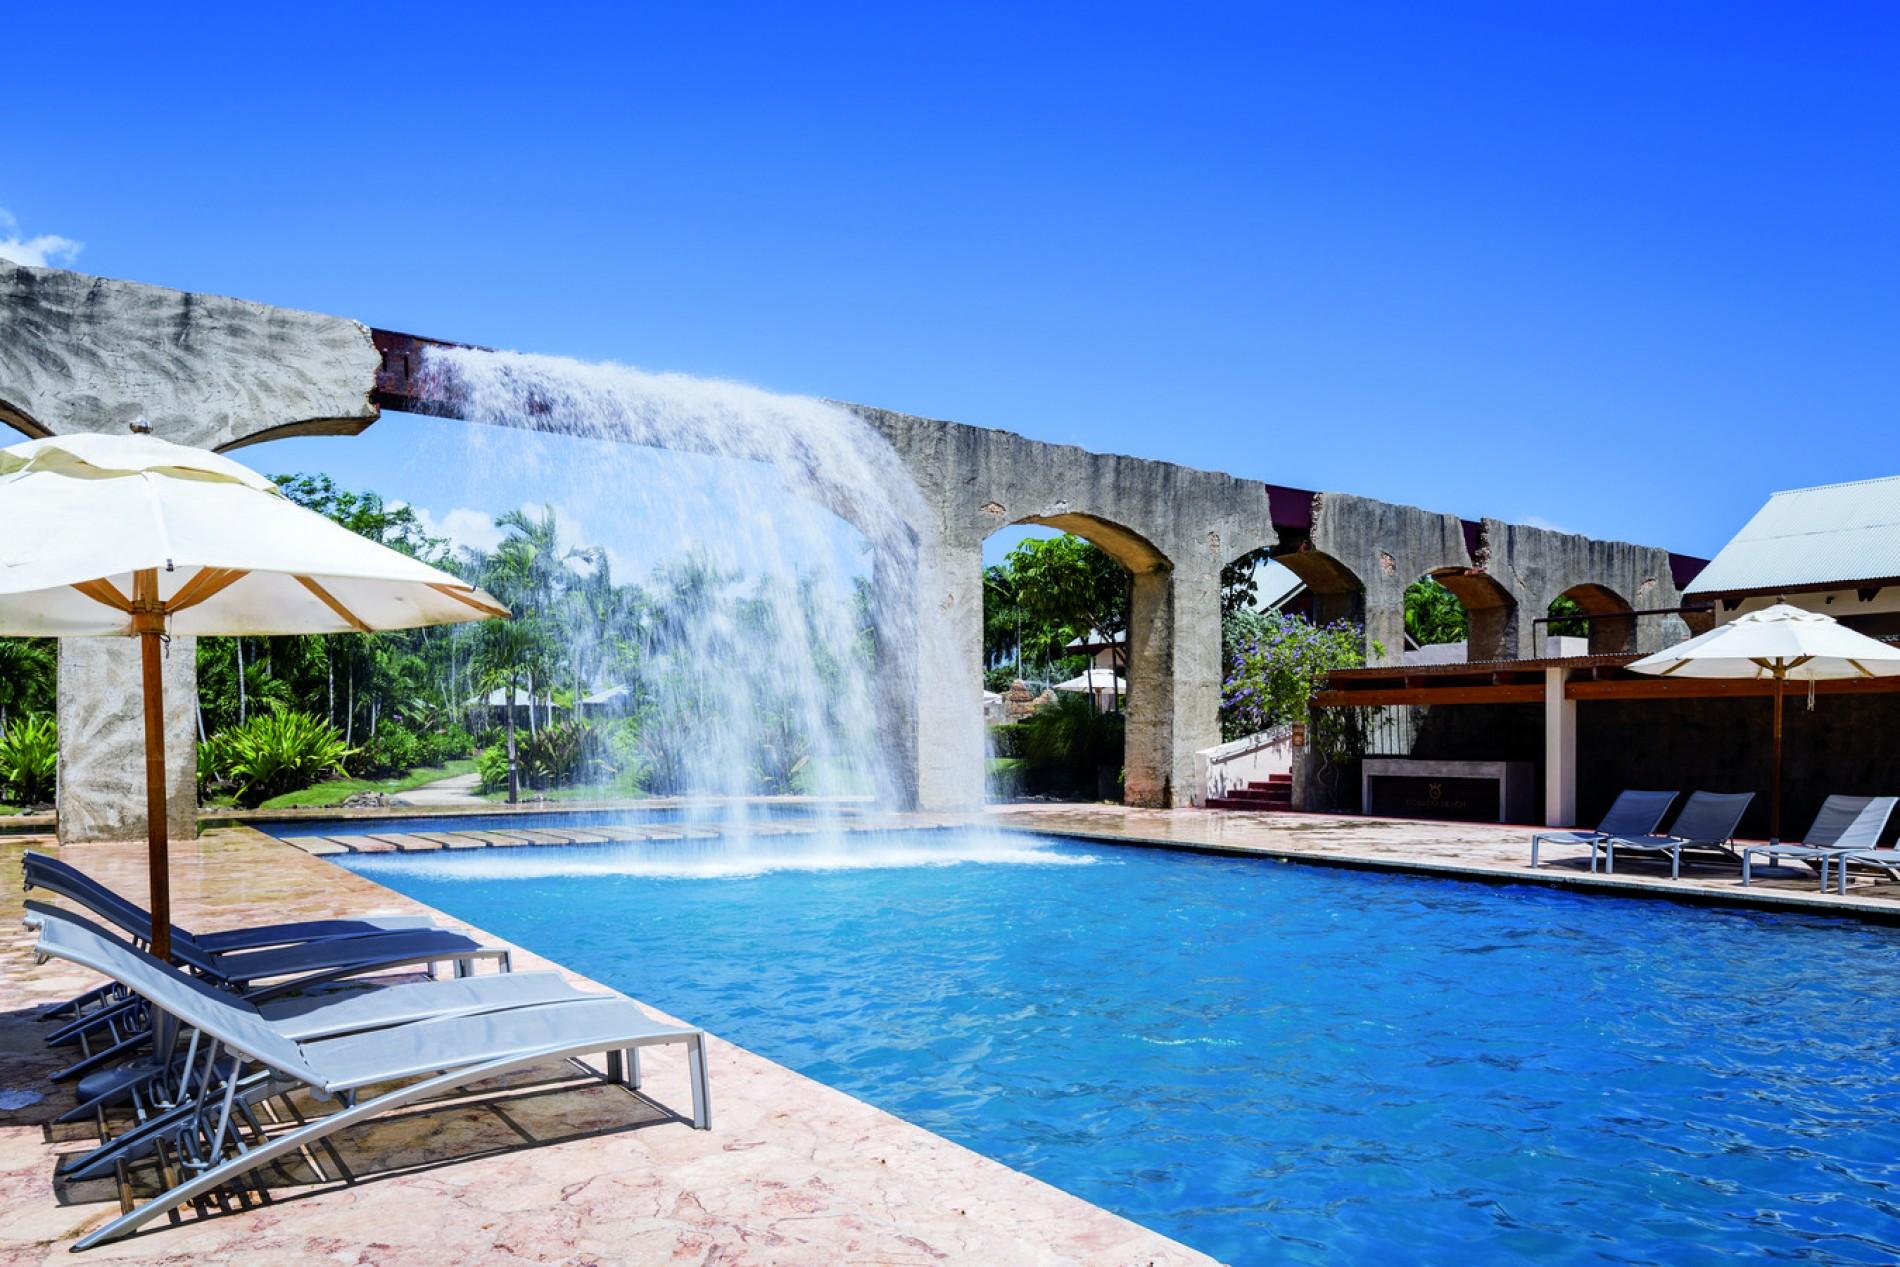 Caribbean Puerto Rico Dorado Beach Su Casa Resort Pool Overview Testimonials